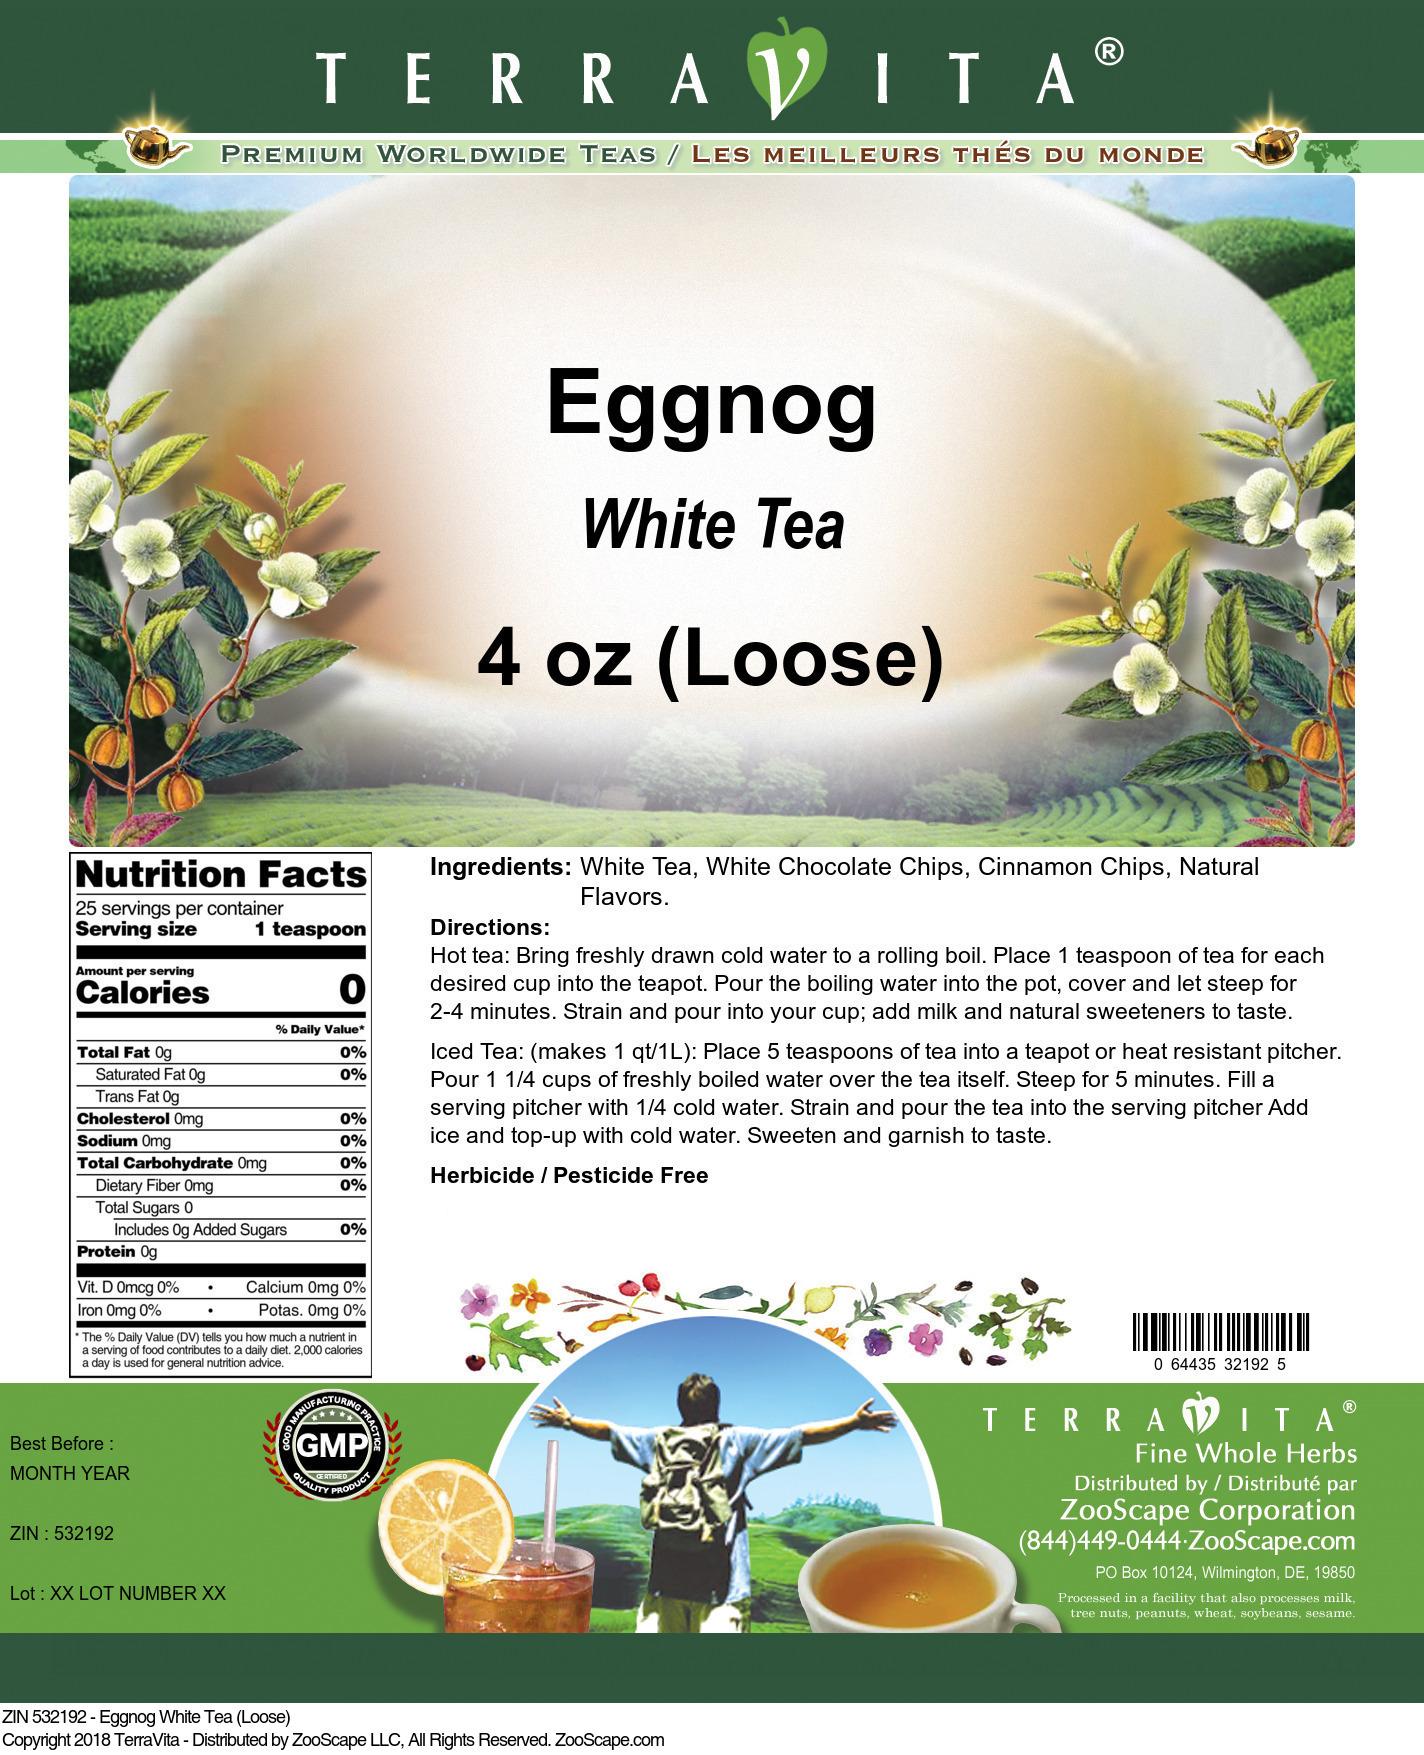 Eggnog White Tea (Loose)